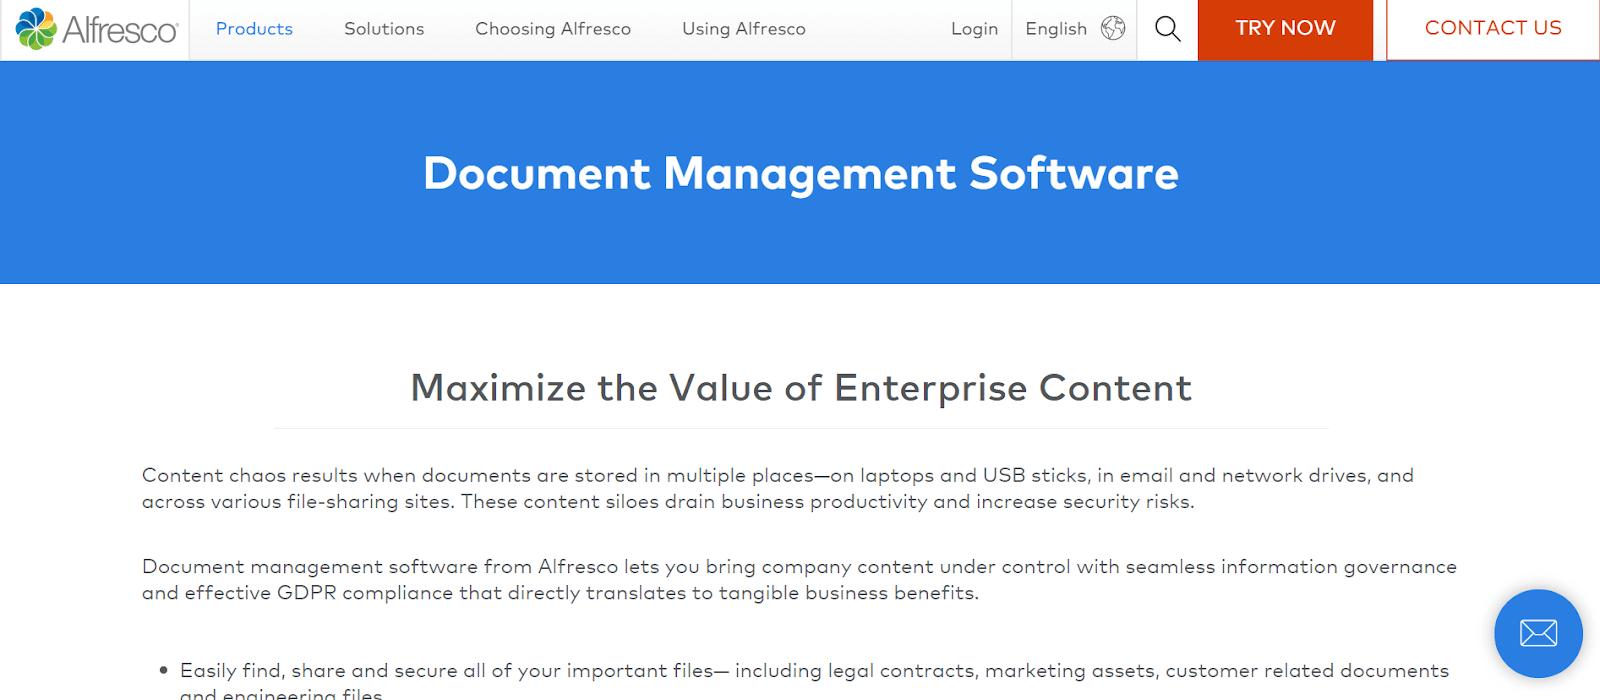 Alfresco Document Management Software